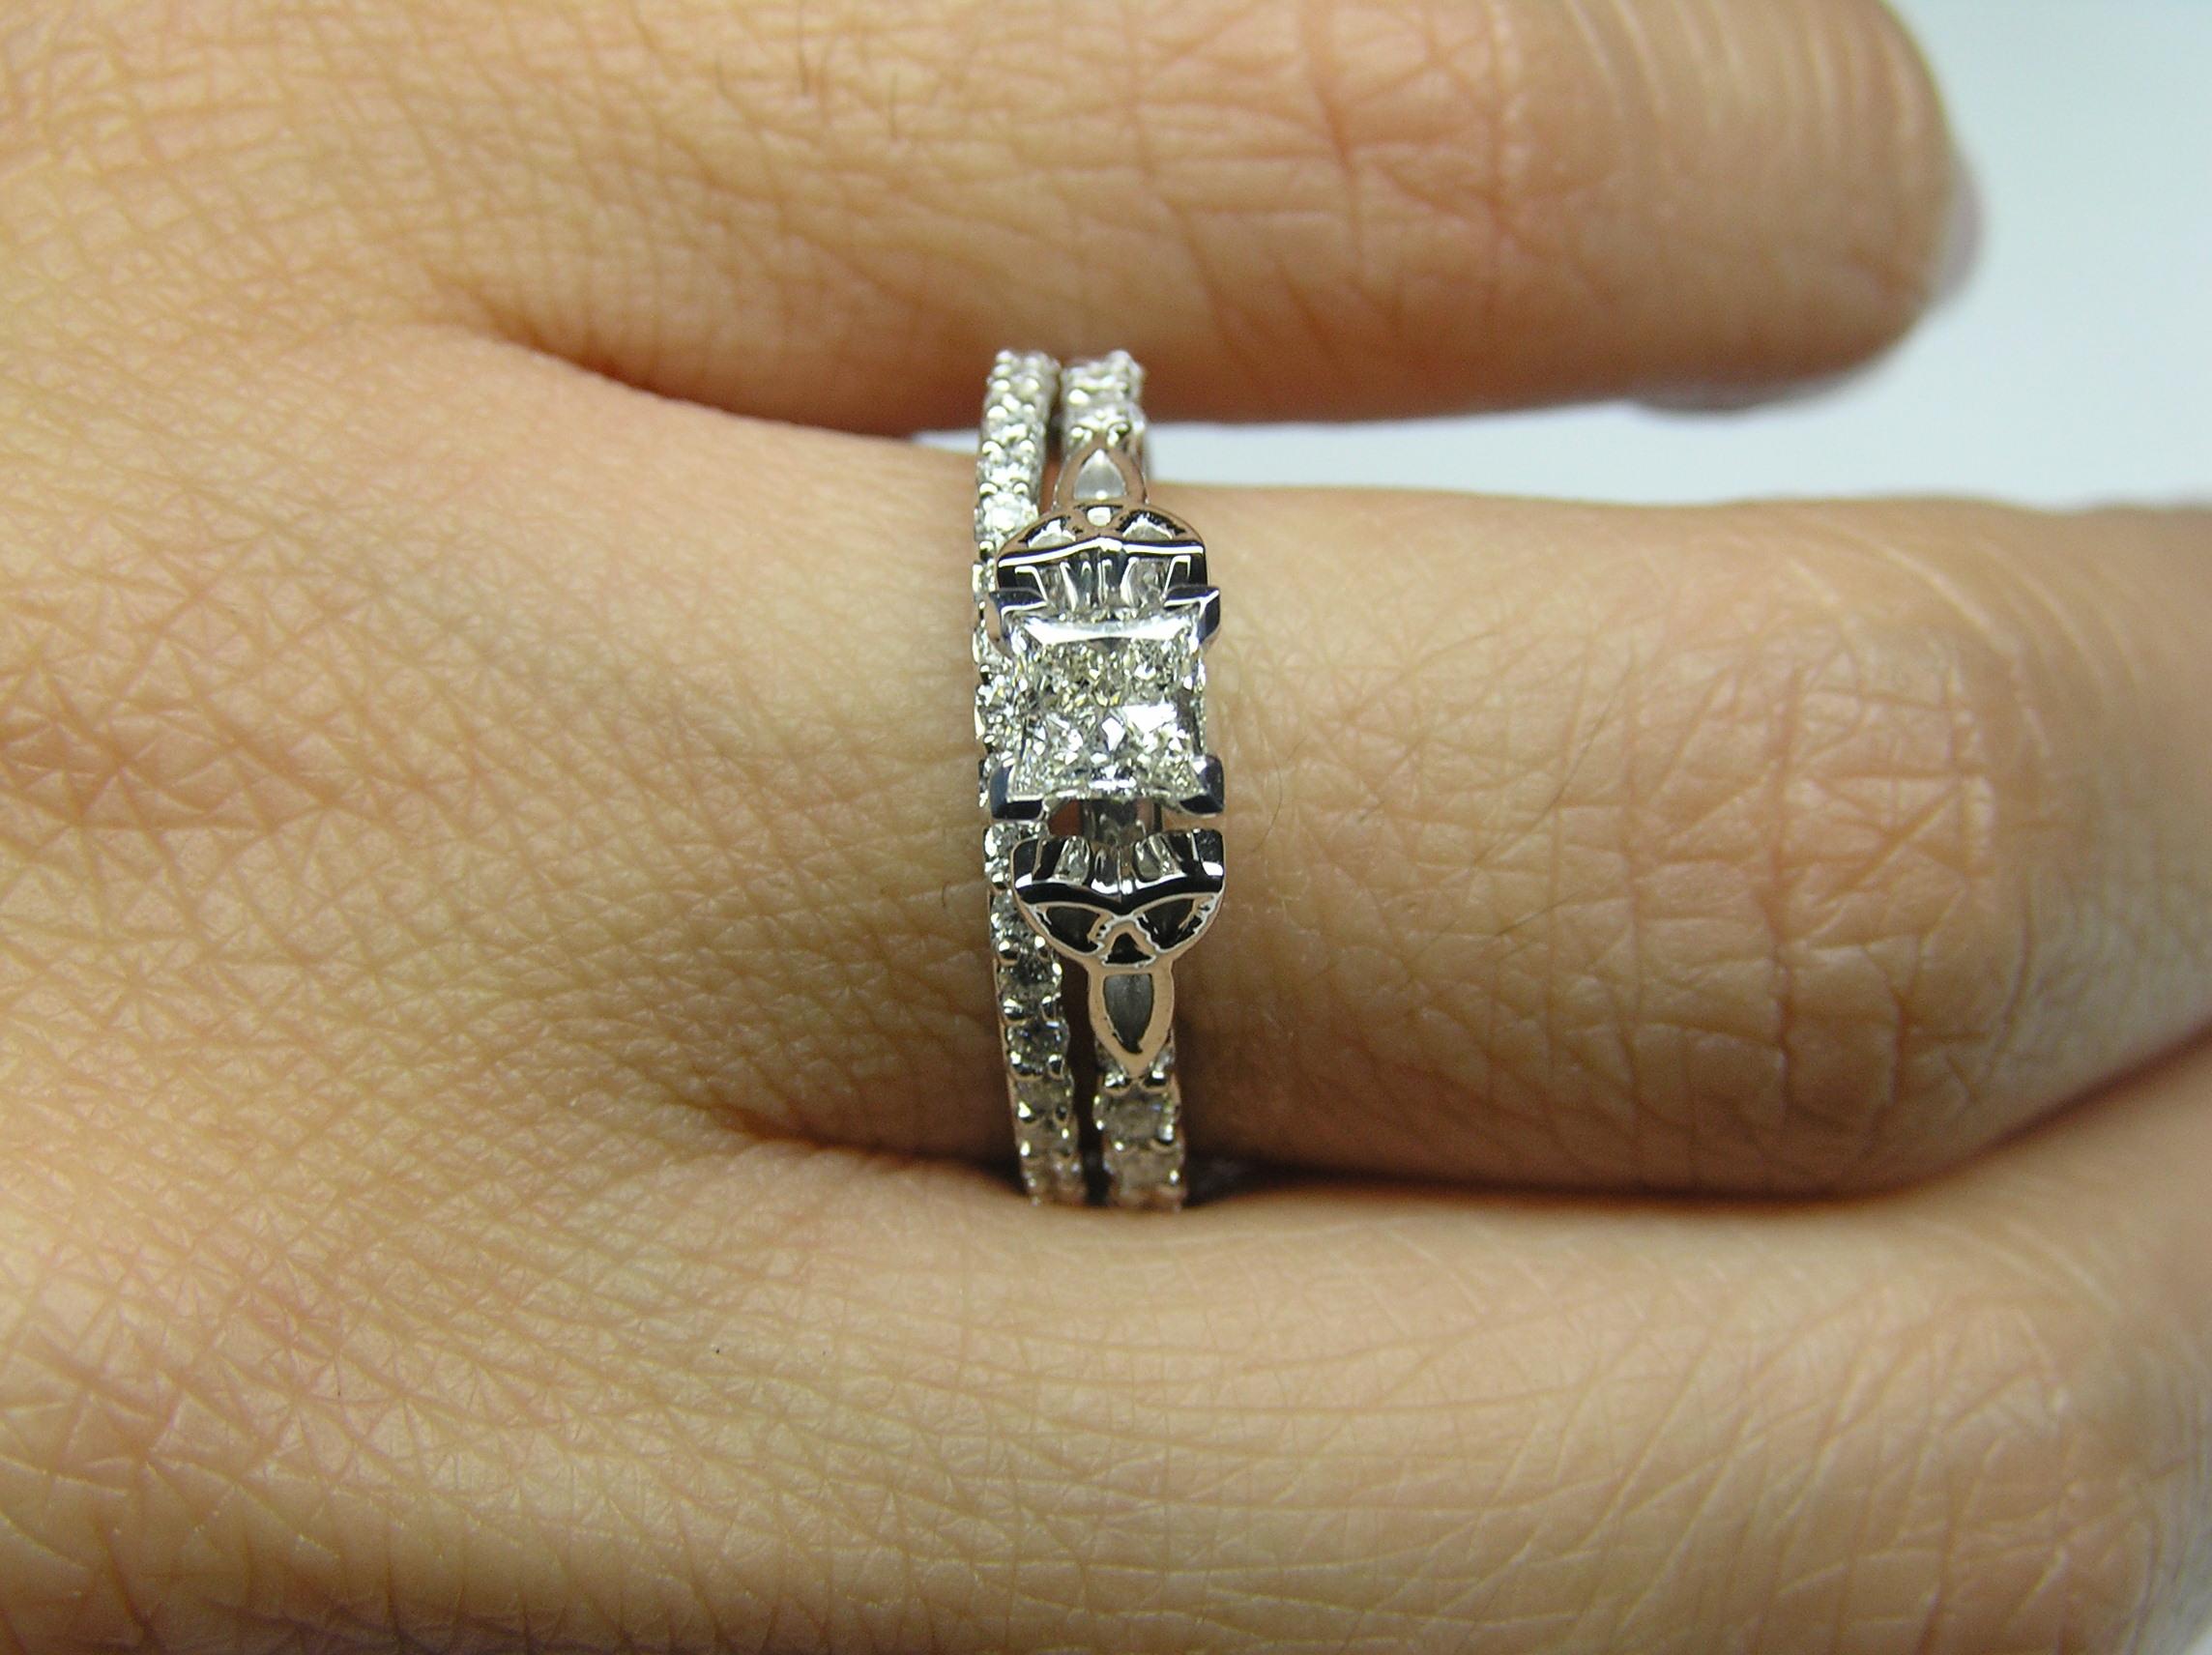 Beautiful Princess Cut Engagement Ring with Matching Wedding Band